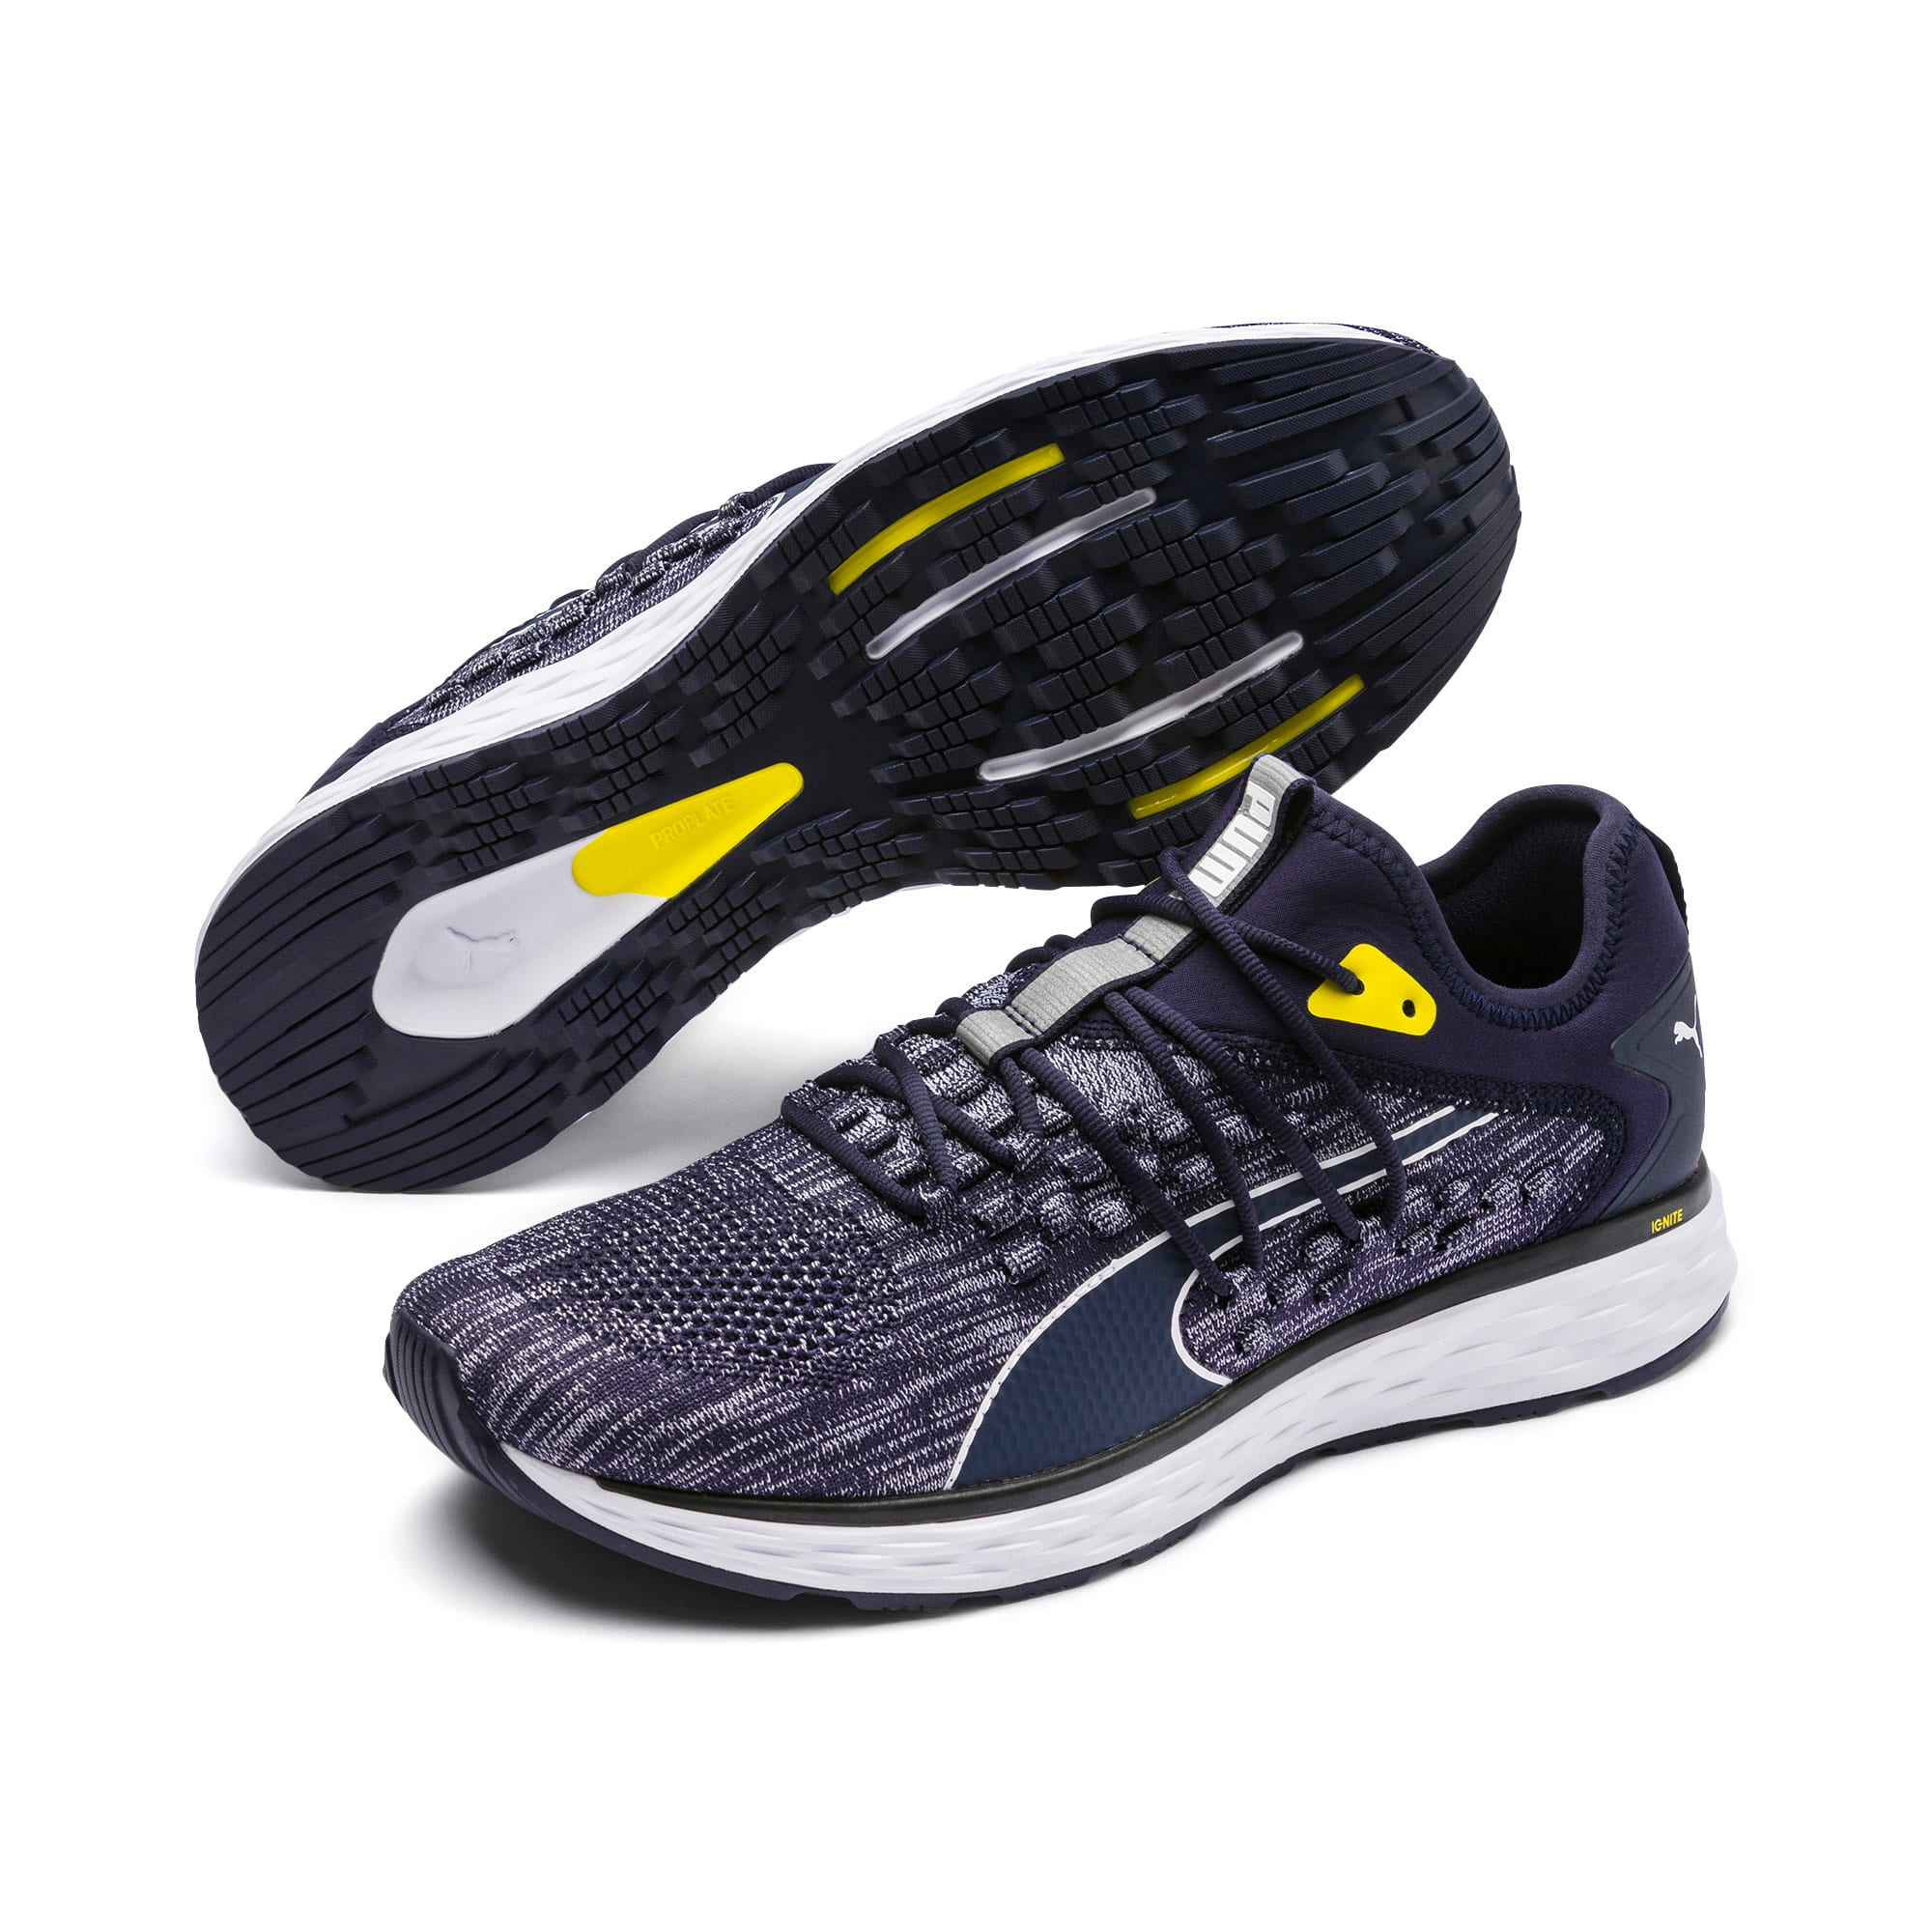 Thumbnail 3 of SPEED FUSEFIT Men's Running Shoes, Peacoat-White-Blazing Yellow, medium